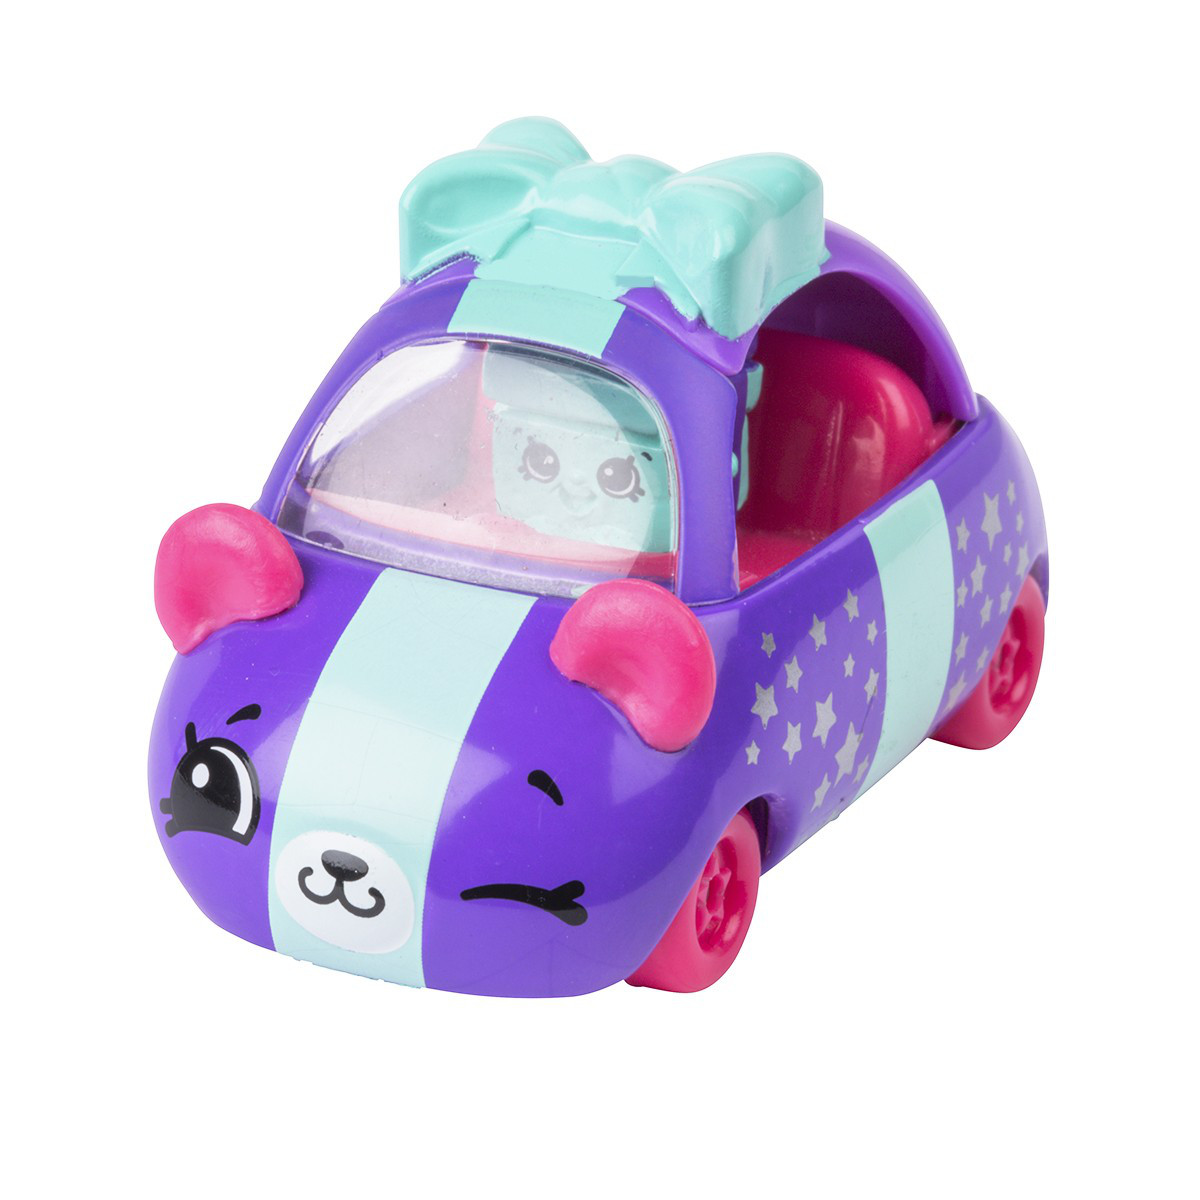 Мини-машинка SHOPKINS CUTIE CARS S3 - ПОДАРОК-ДРИФТ (с мини-шопкинсом)